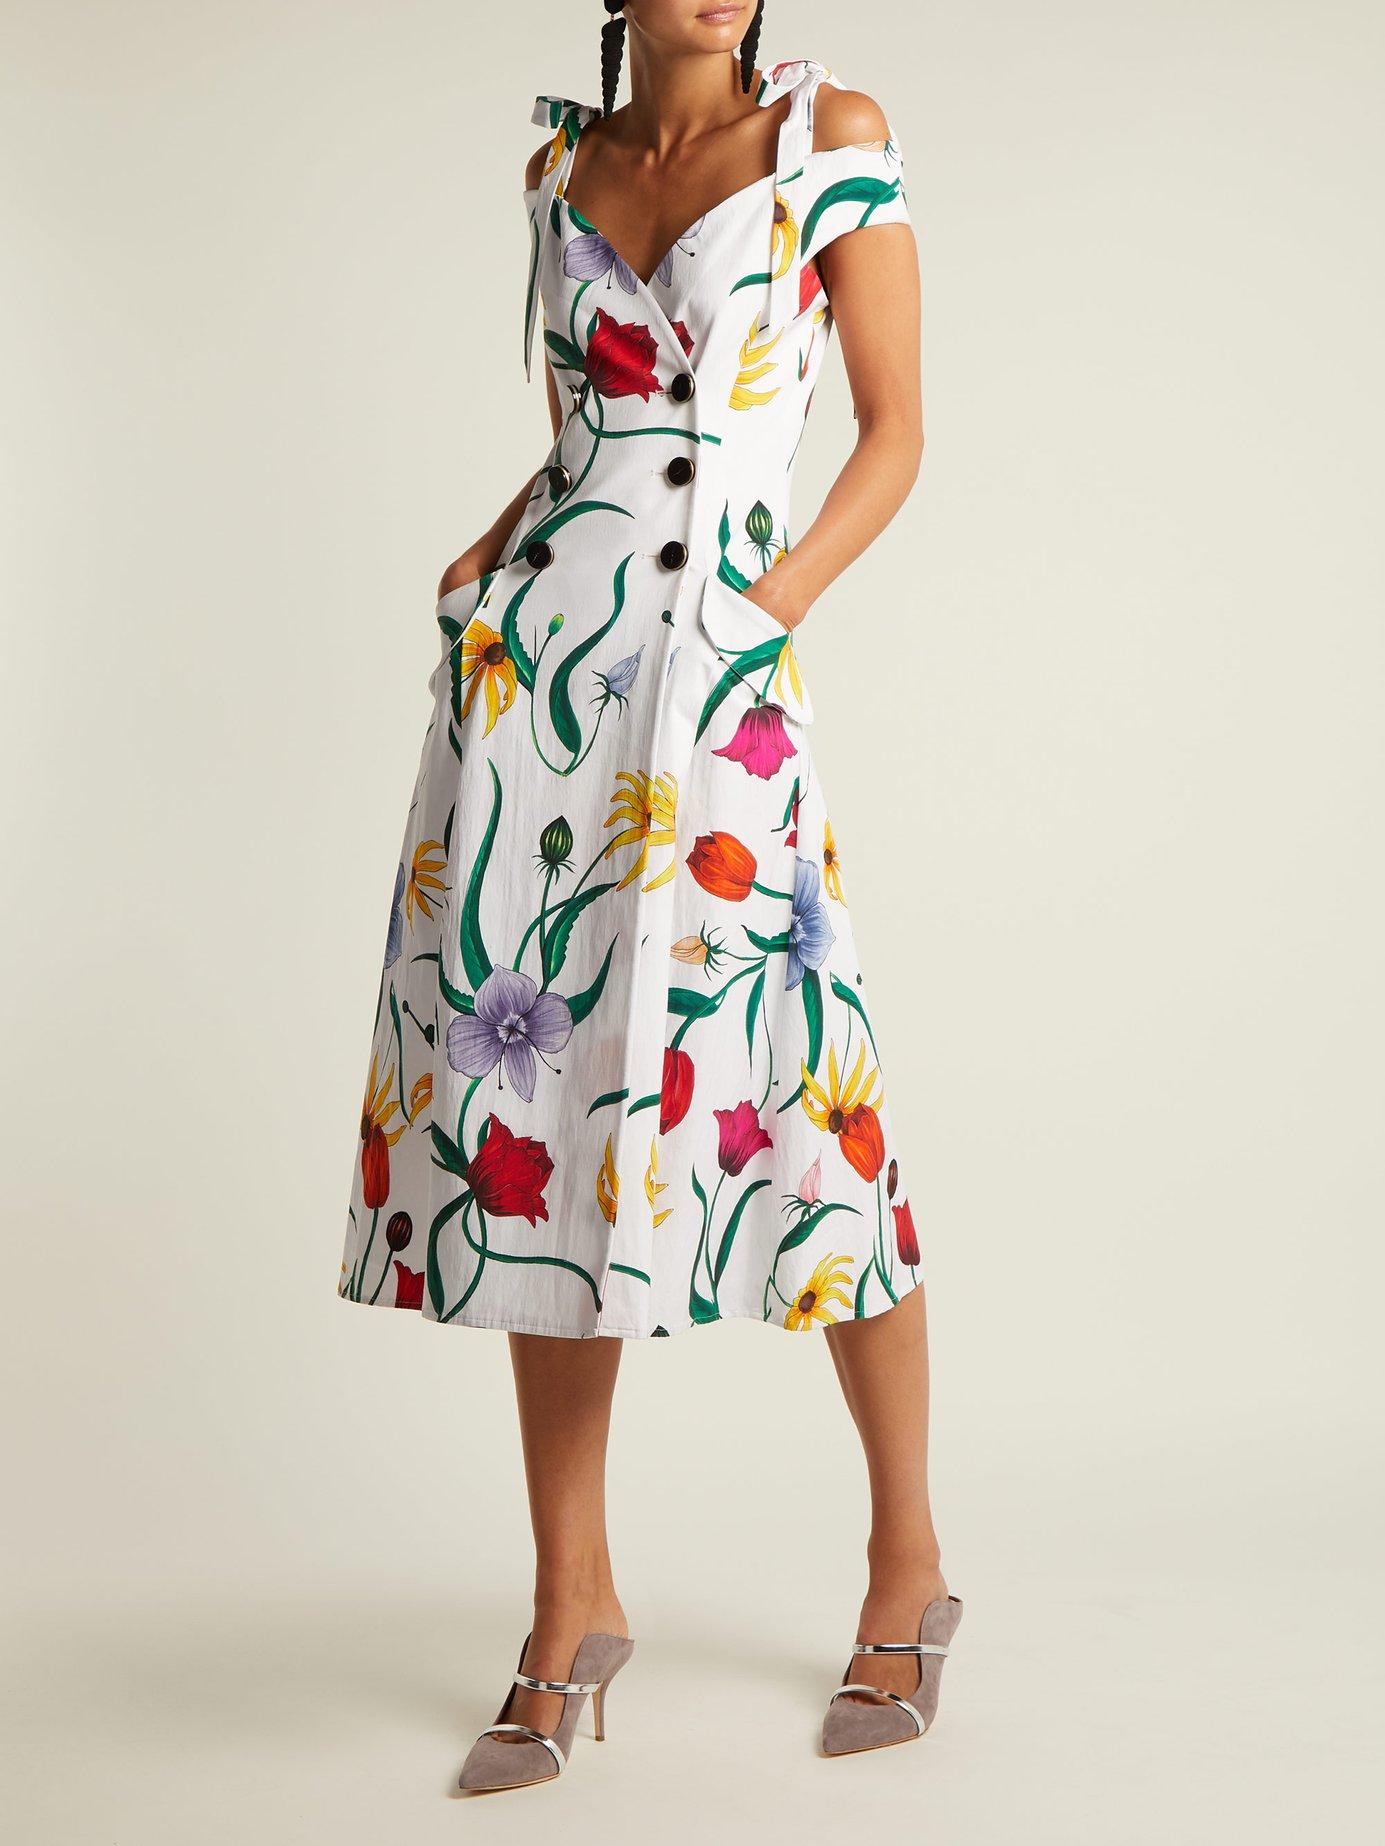 Floral-print cotton-blend faille dress by Carolina Herrera